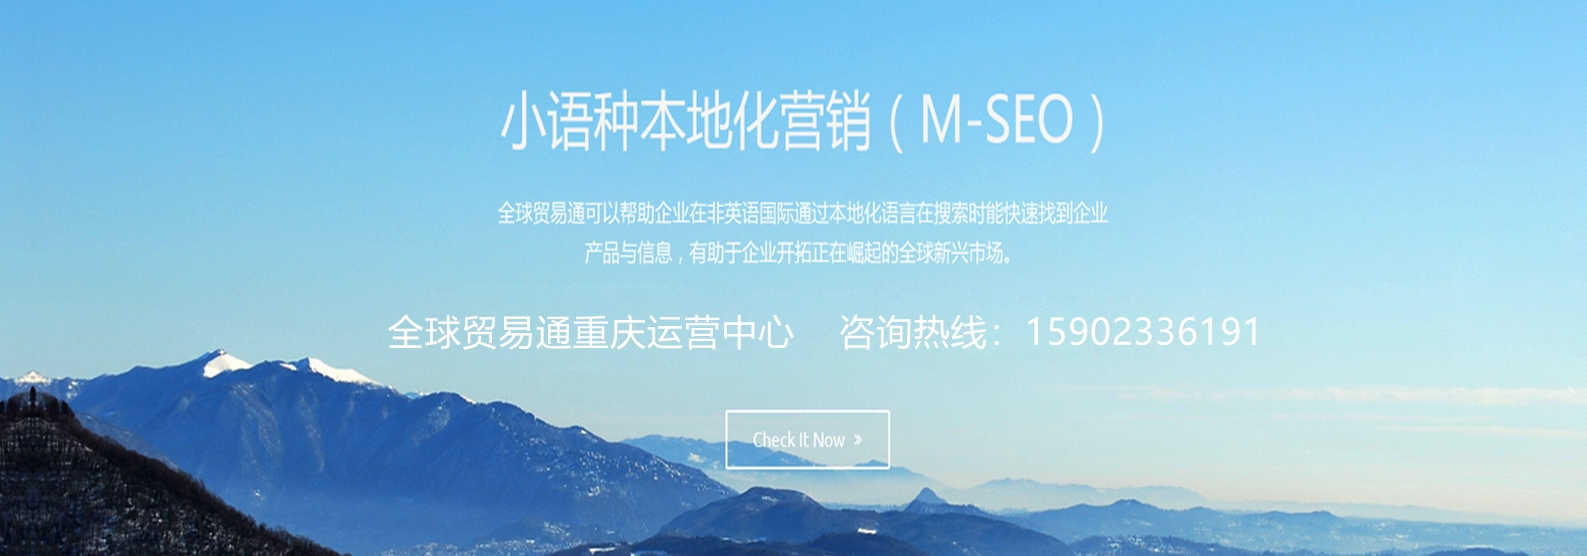 Google外贸seo推广